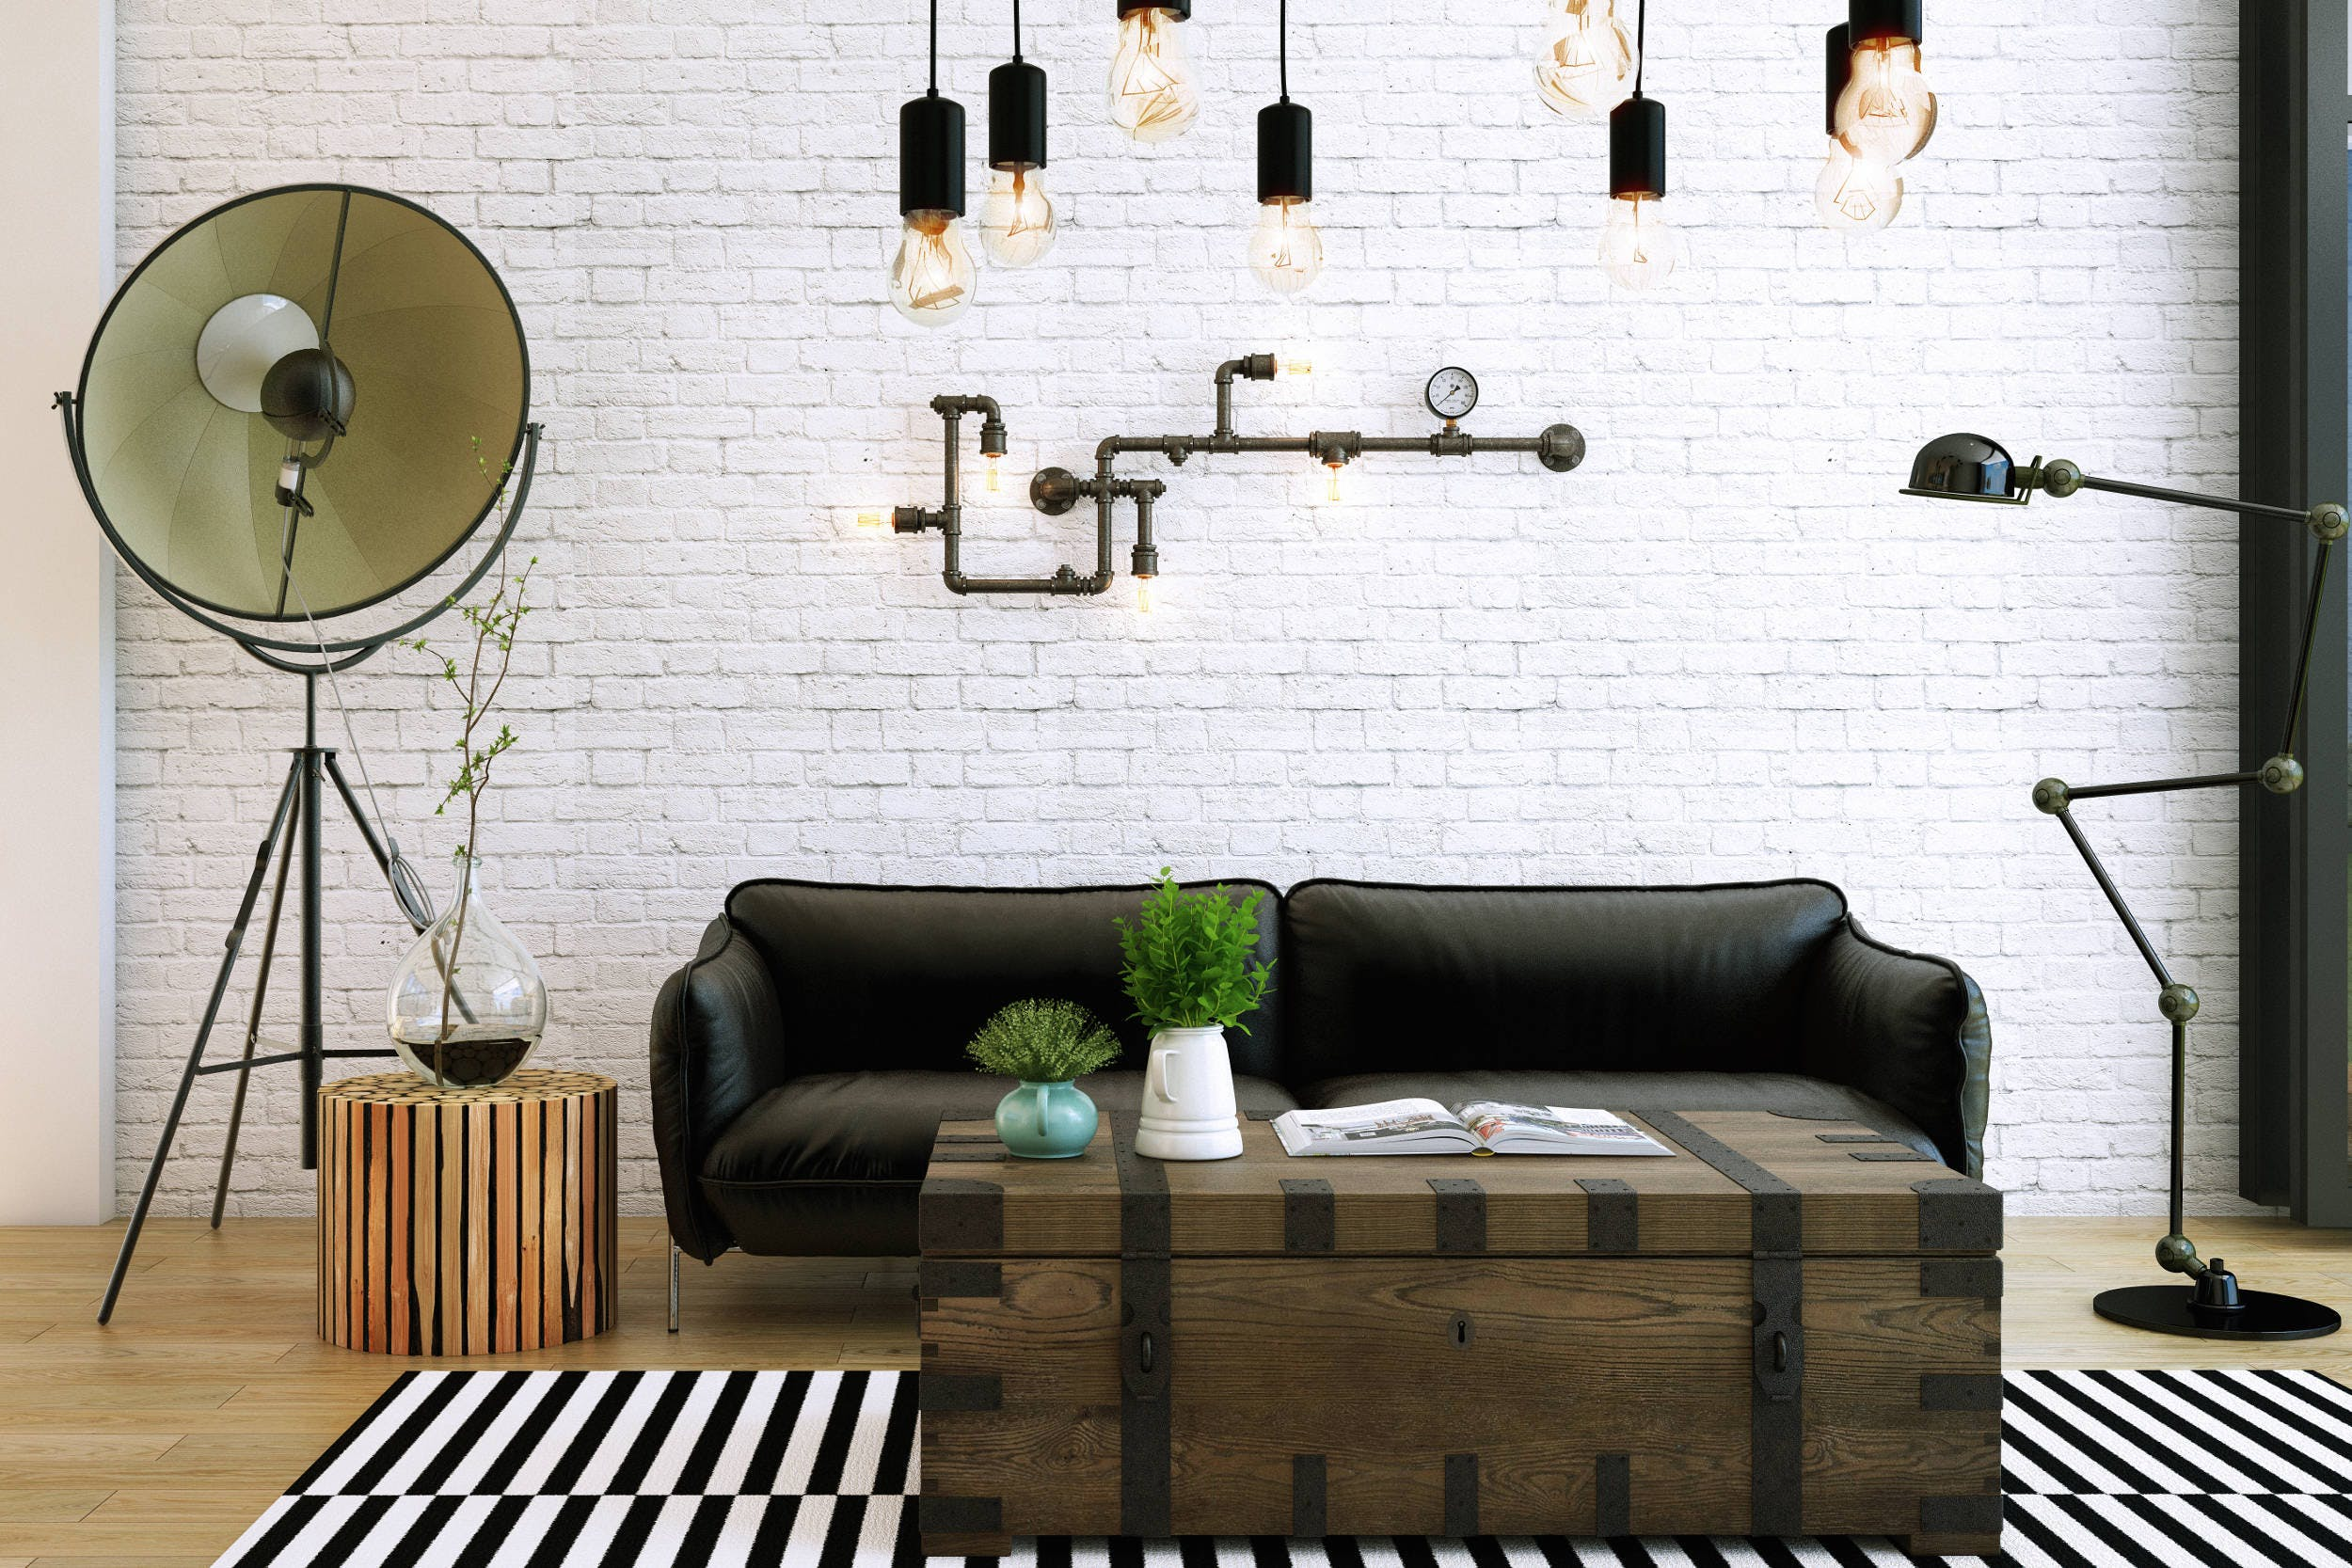 Image of shutterstock 1068732656 1 in Industrial style in interior design - Cosentino